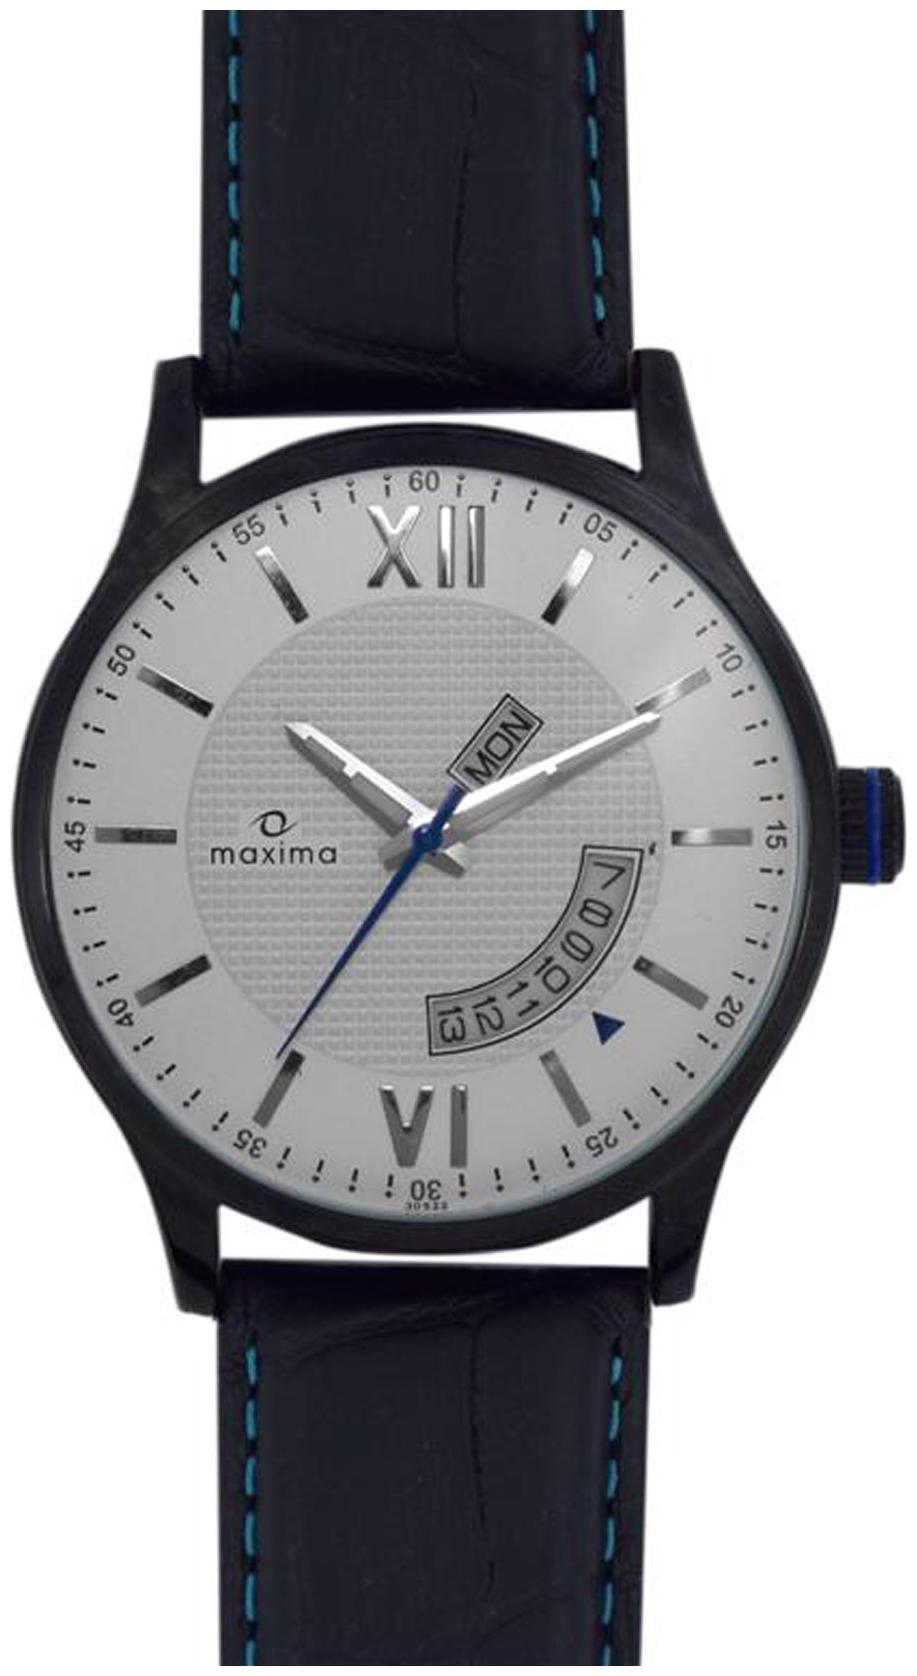 Maxima Attivo Collection 30522Lm  gb Men Analog Watch